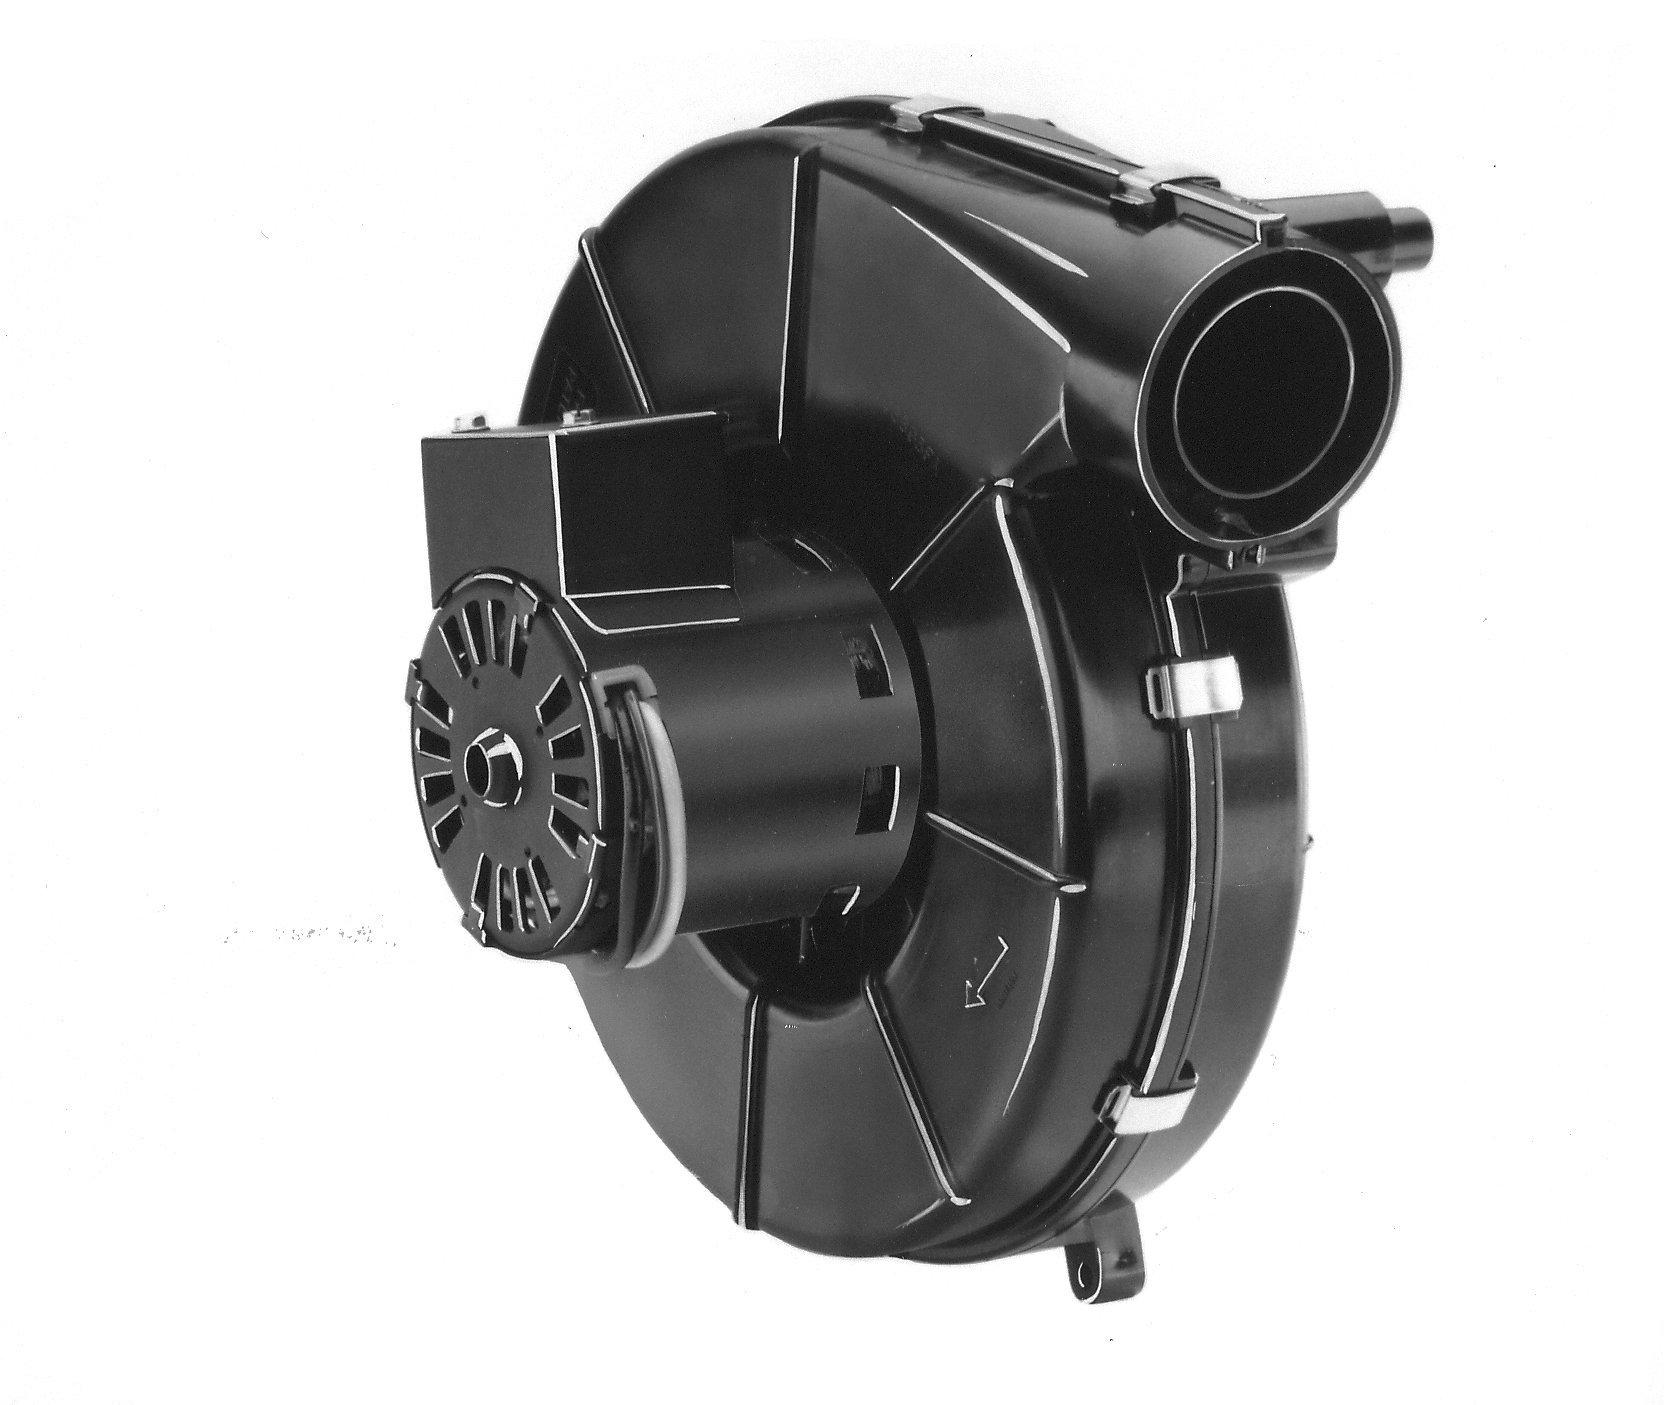 Fasco A145 Specific Purpose Blowers, Inter City 7062-4061